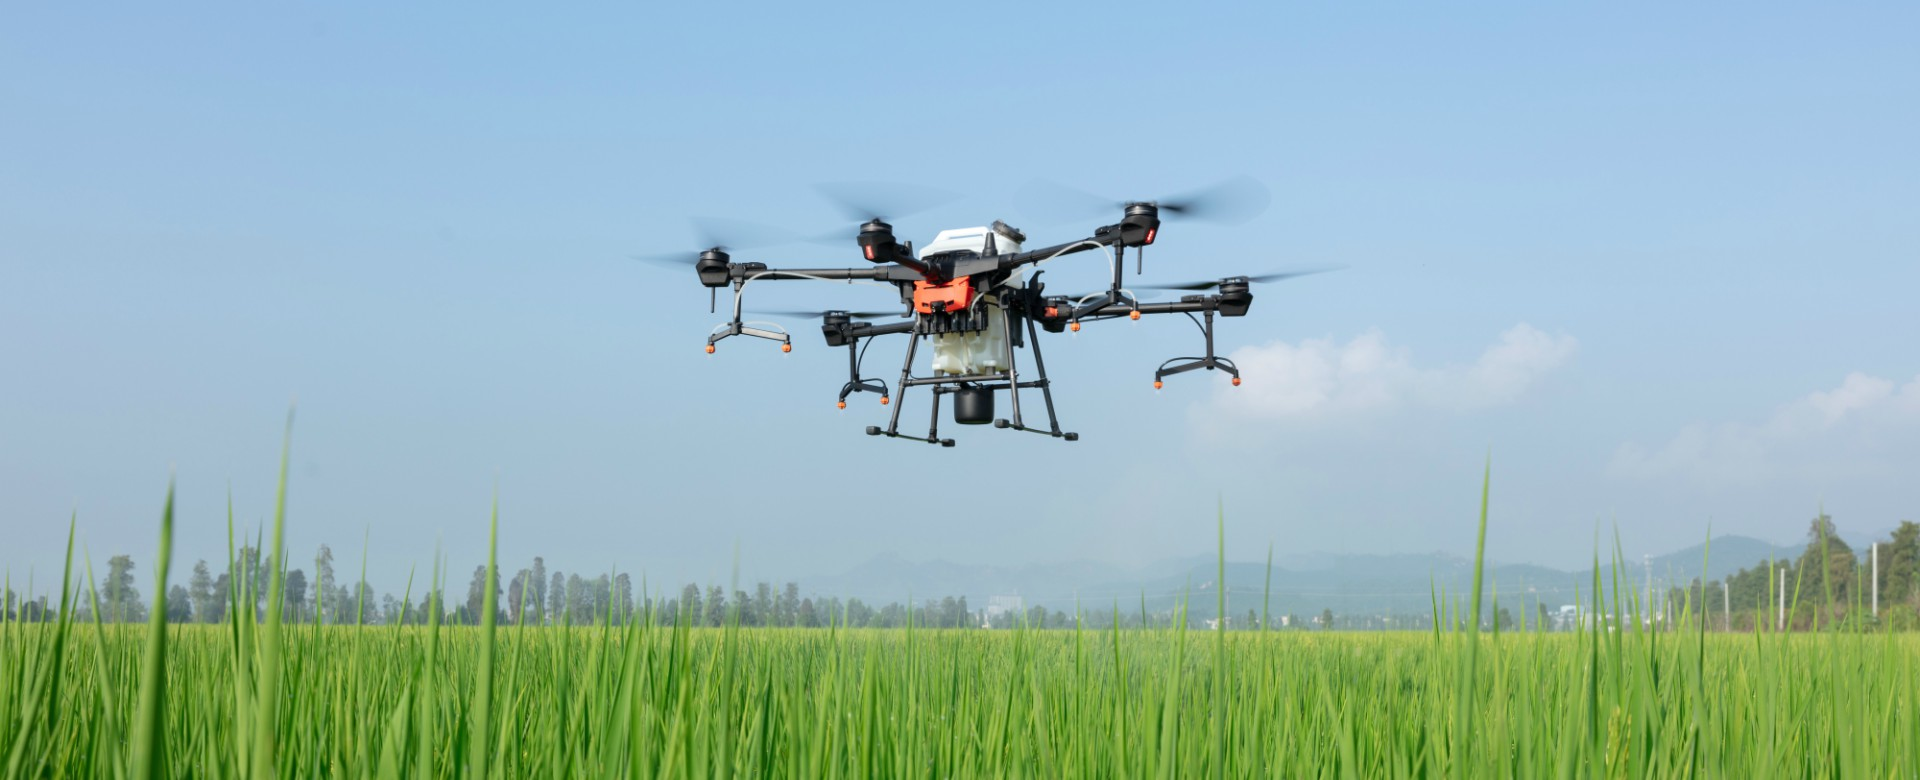 AeroSpray - prikaz drona